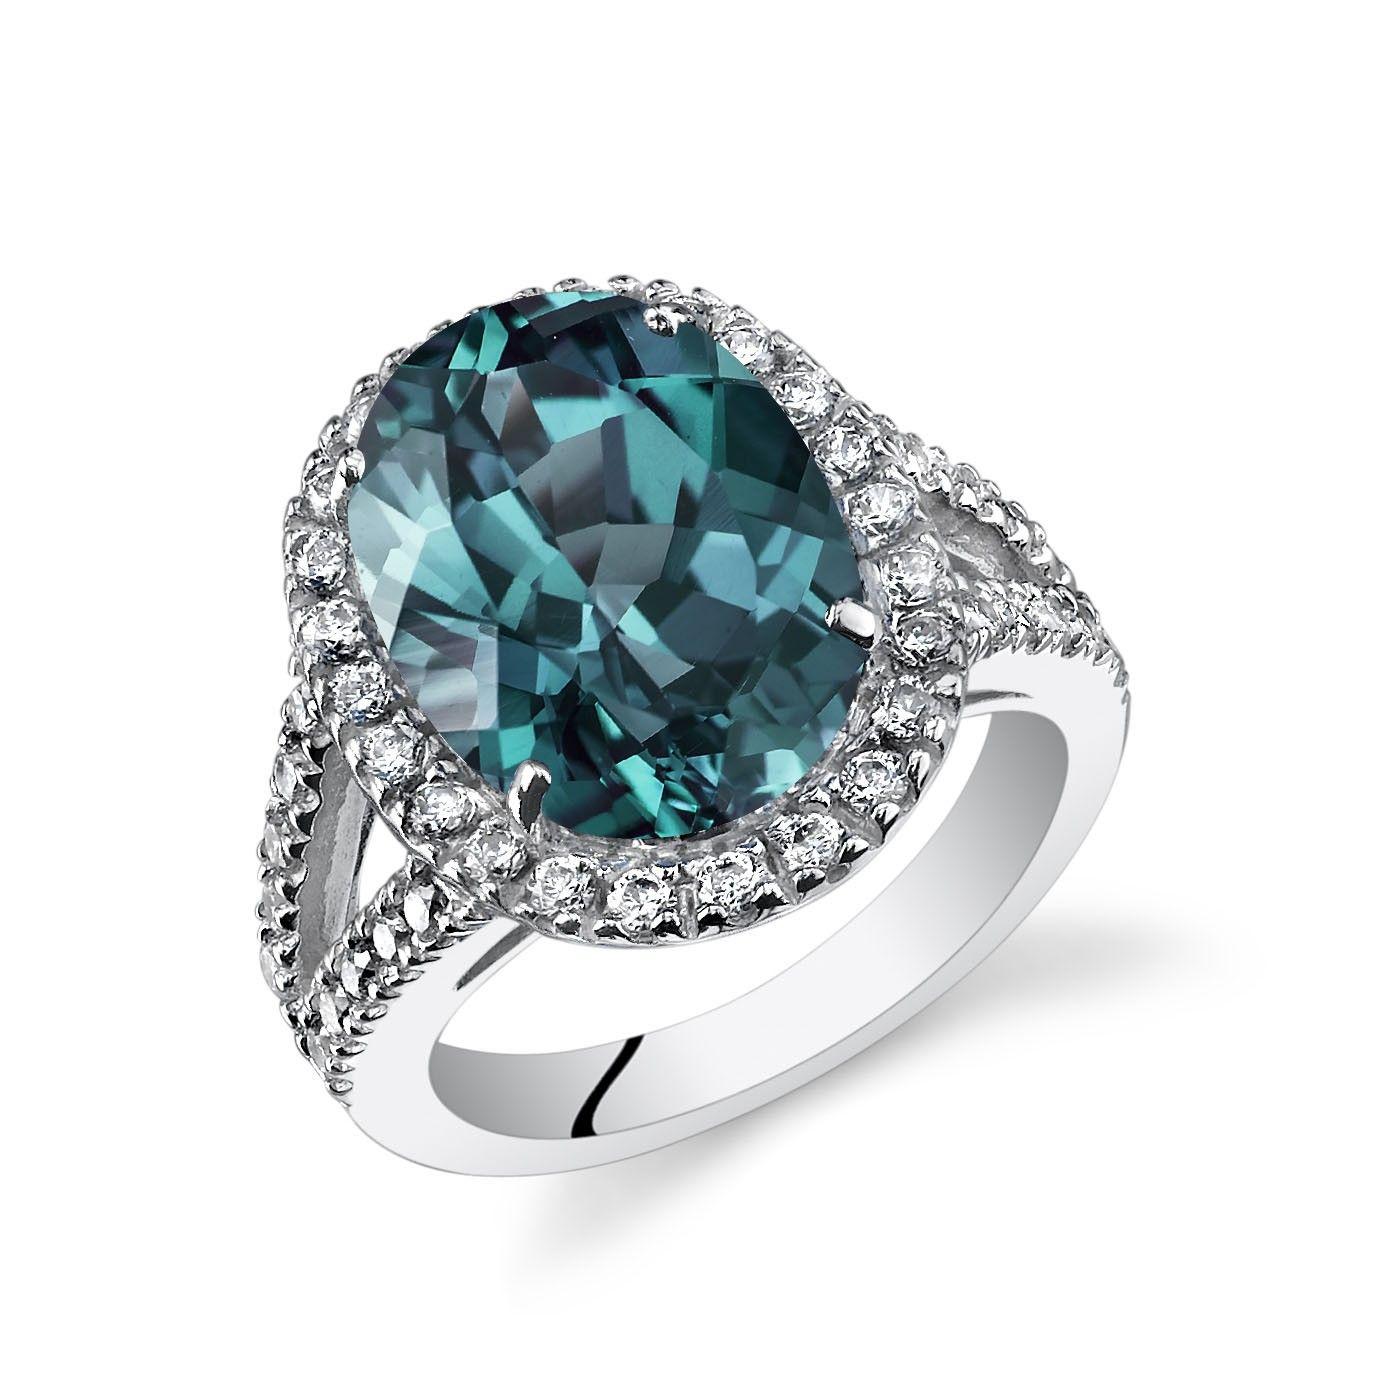 Pin By Ruby Oscar On Ruby Oscar Gemstones To Match Your